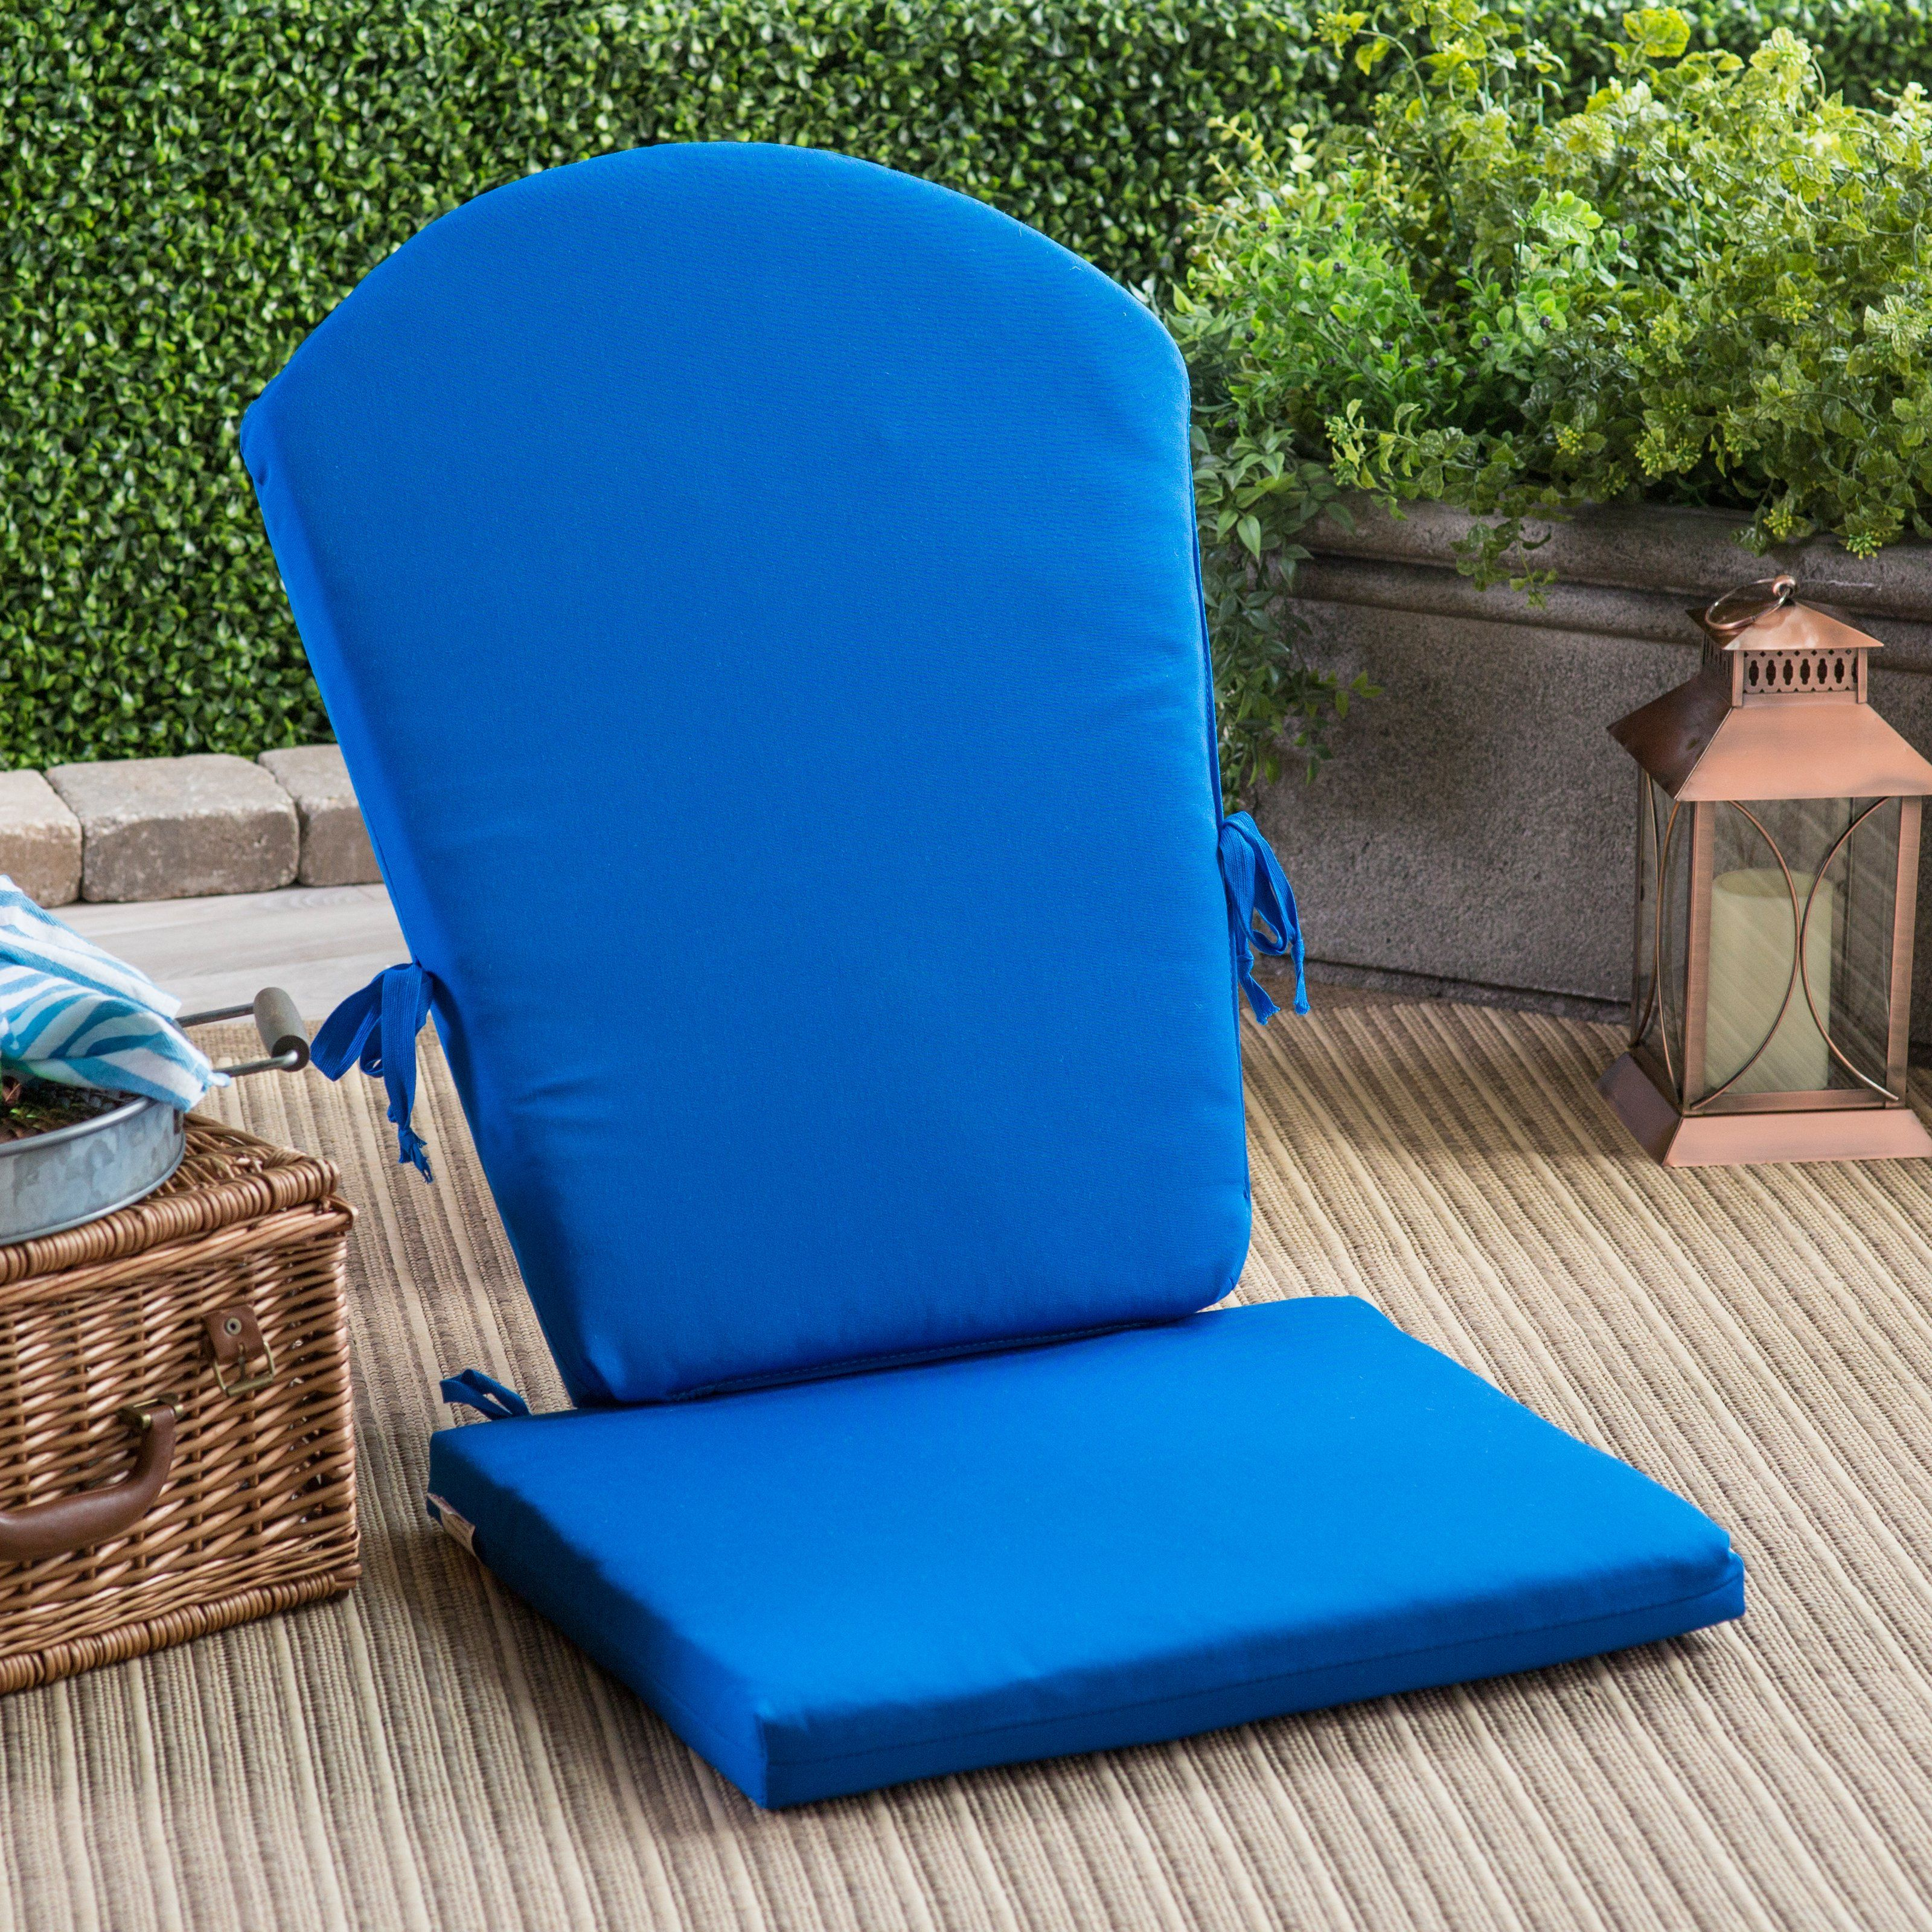 Polywood South Beach 46 25 X 22 Sunbrella Adirondack Chair